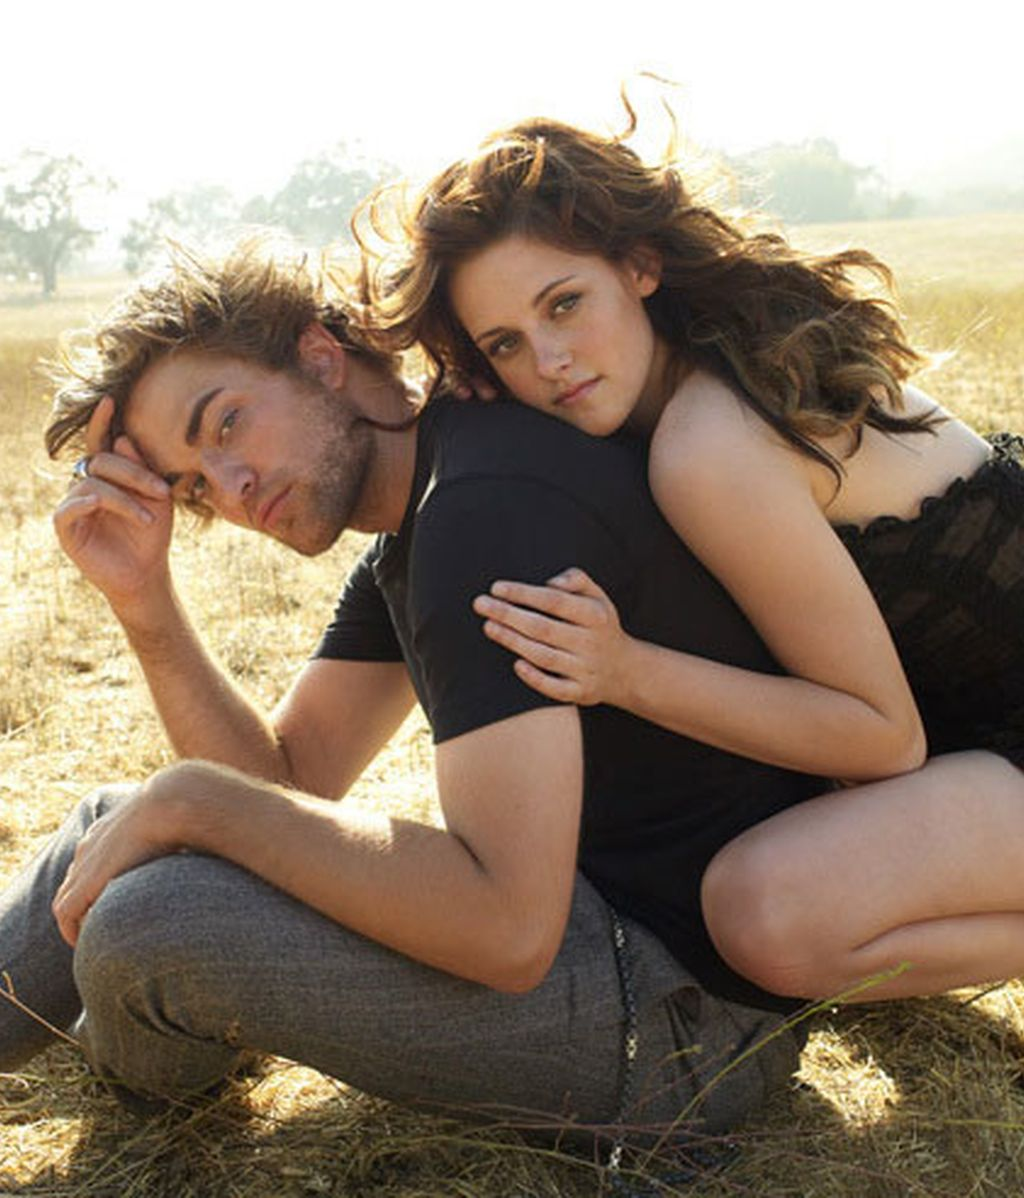 Robert Pattinson y Kristen Stewart en una imagen de archivo